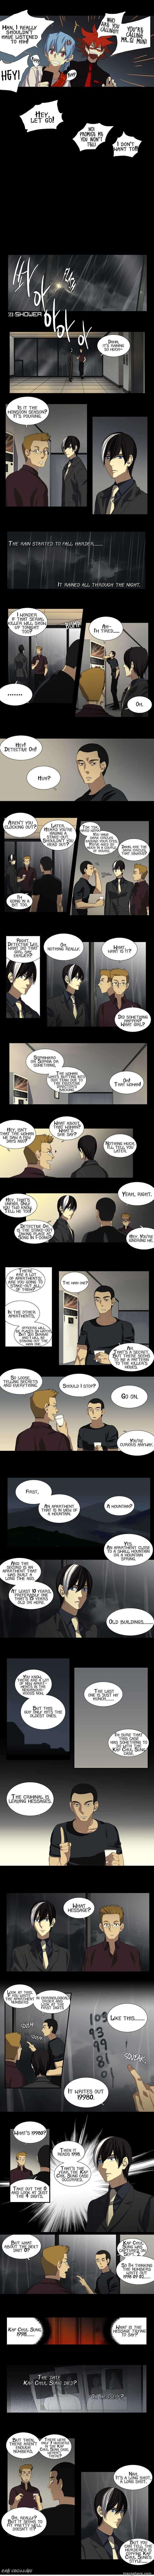 Supernatural Investigation Department 26 Page 2